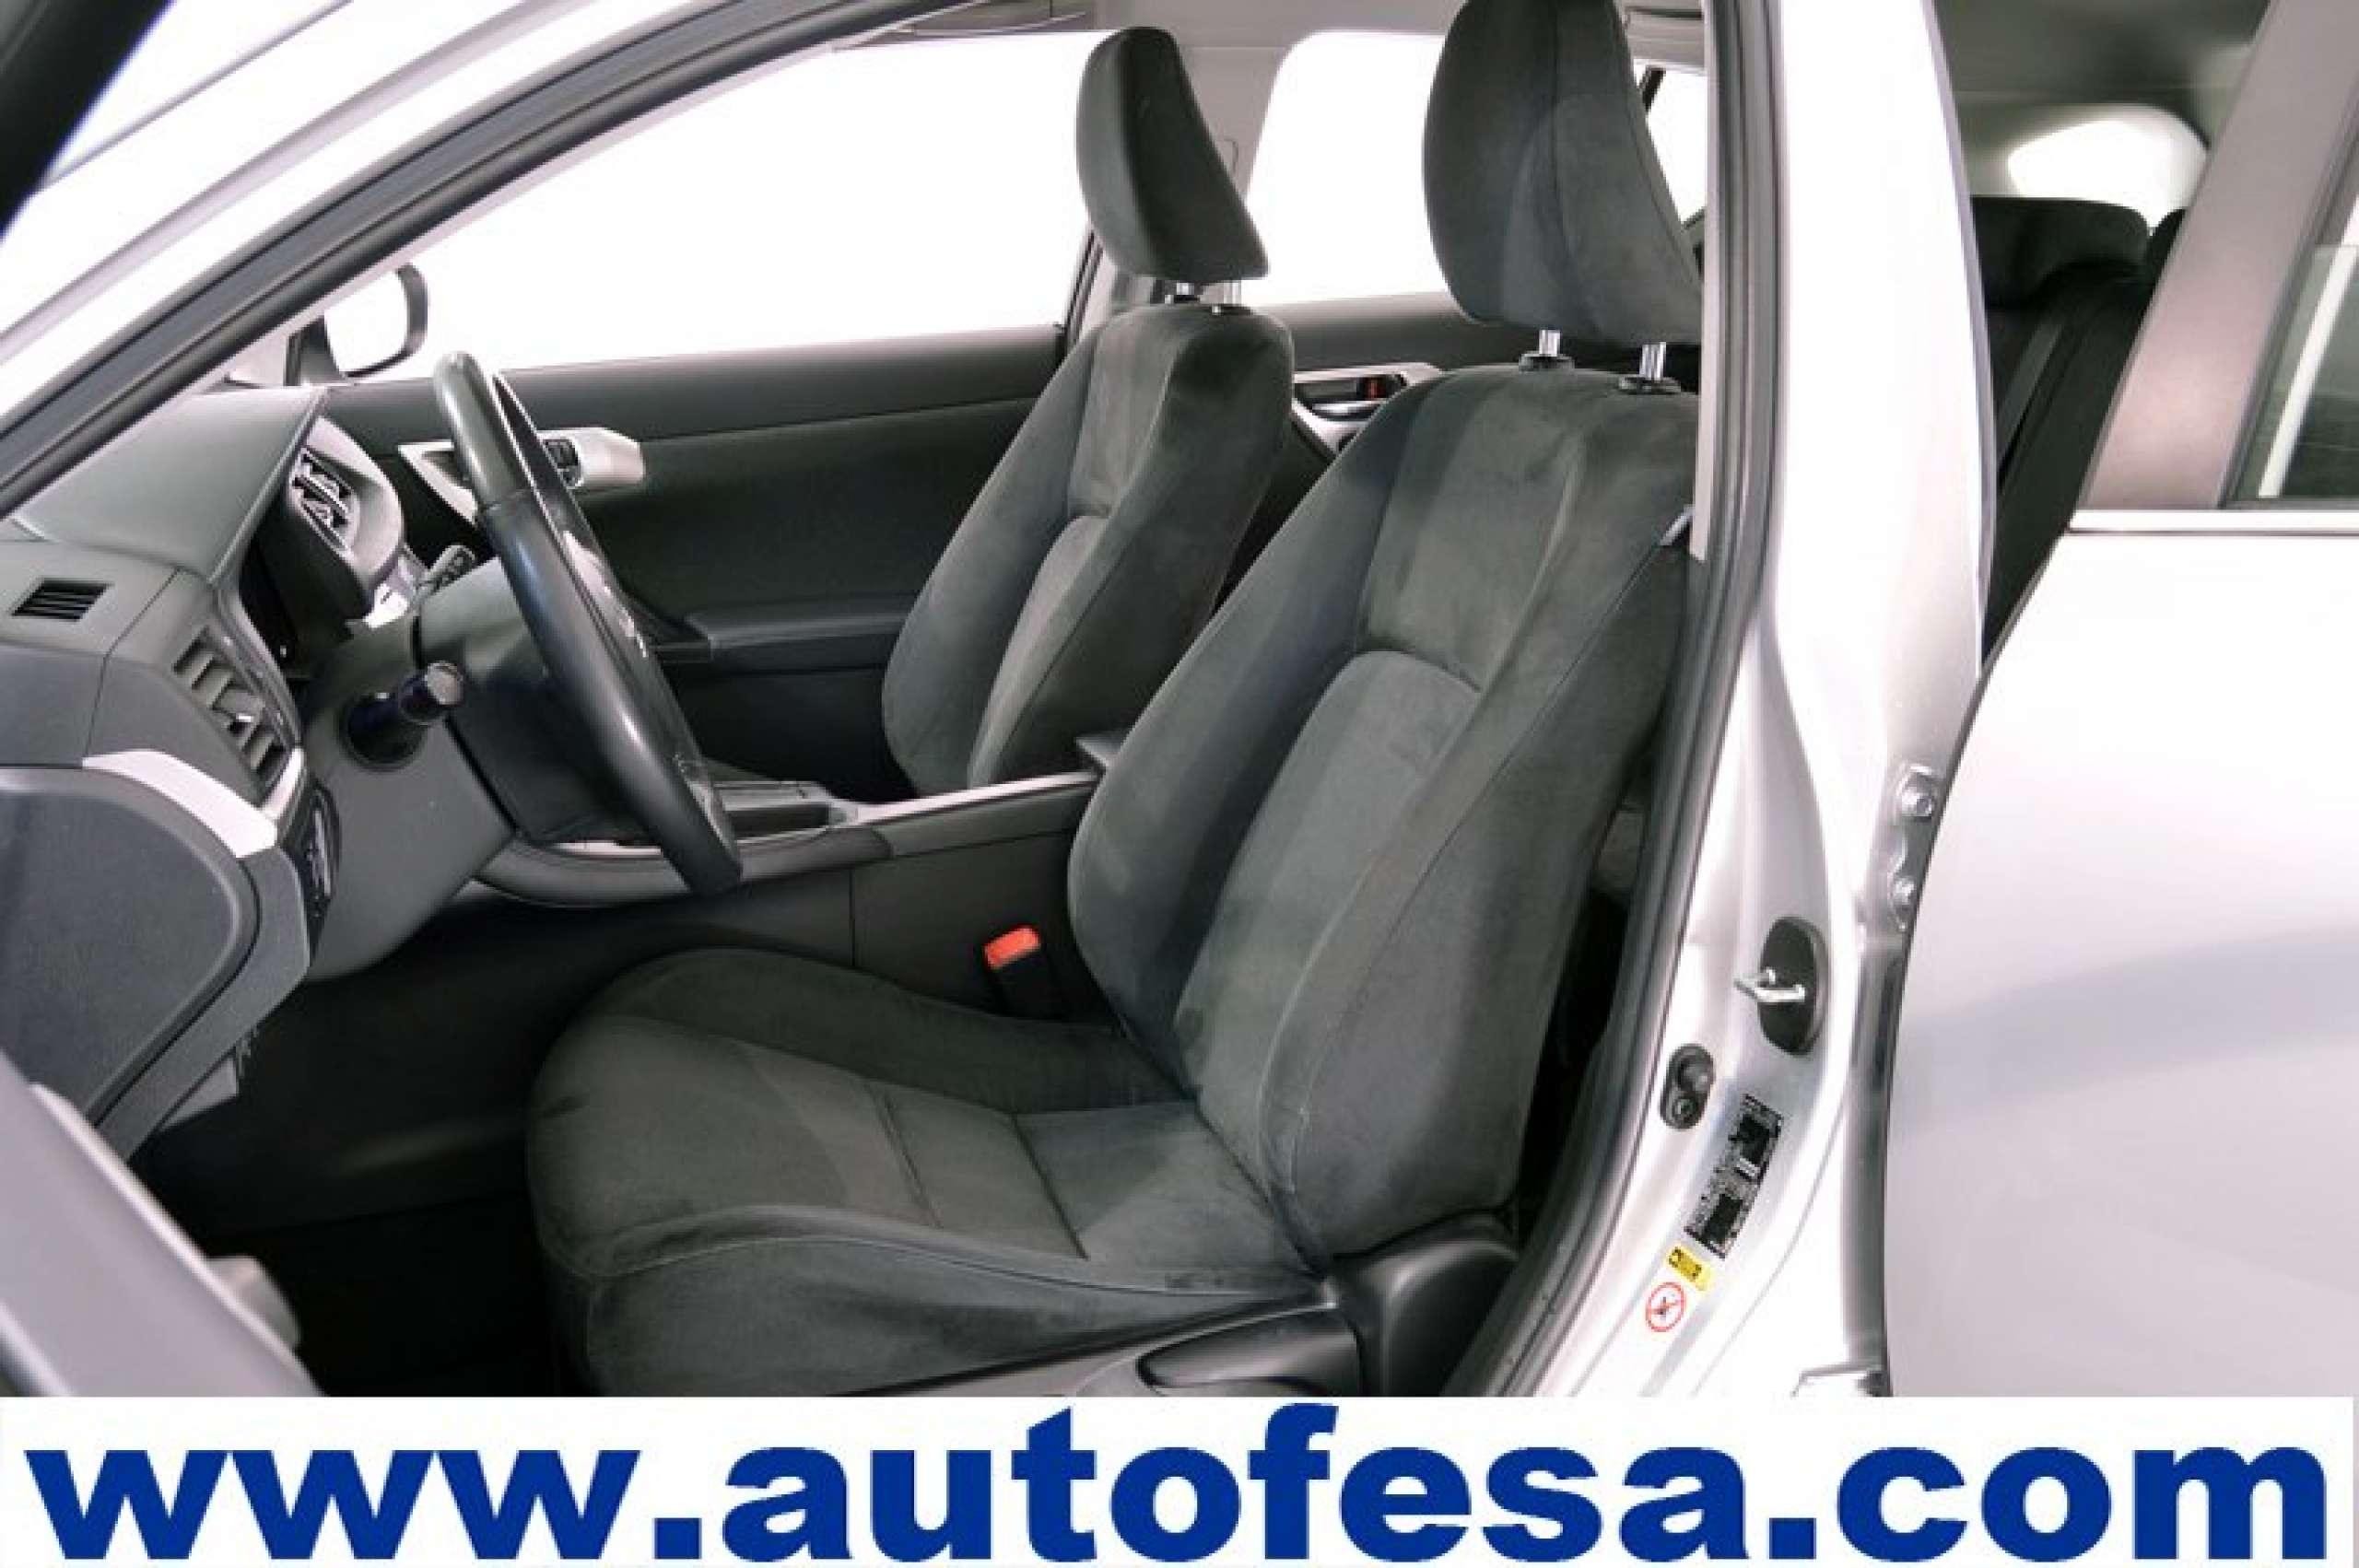 Lexus Ct 200h 1.8 136cv Eco Auto 5p - Foto 28